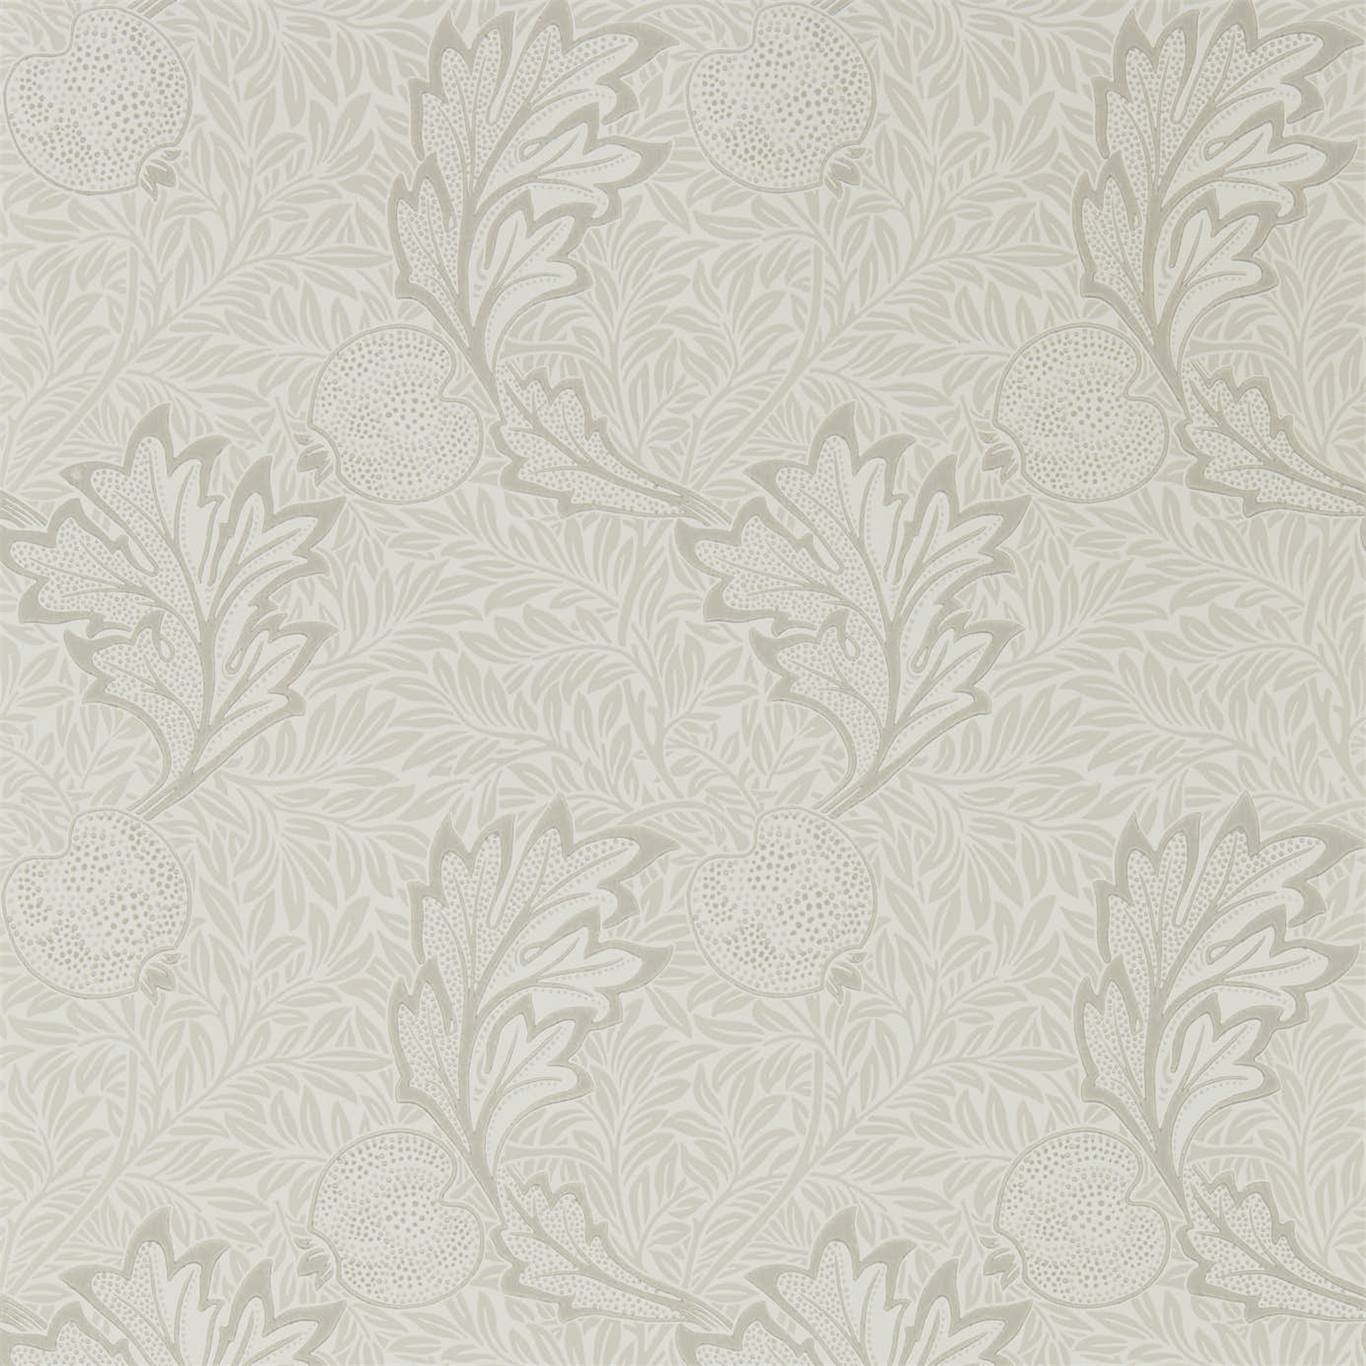 Image of Morris & Co Apple Chalk Ivory Wallpaper 216692